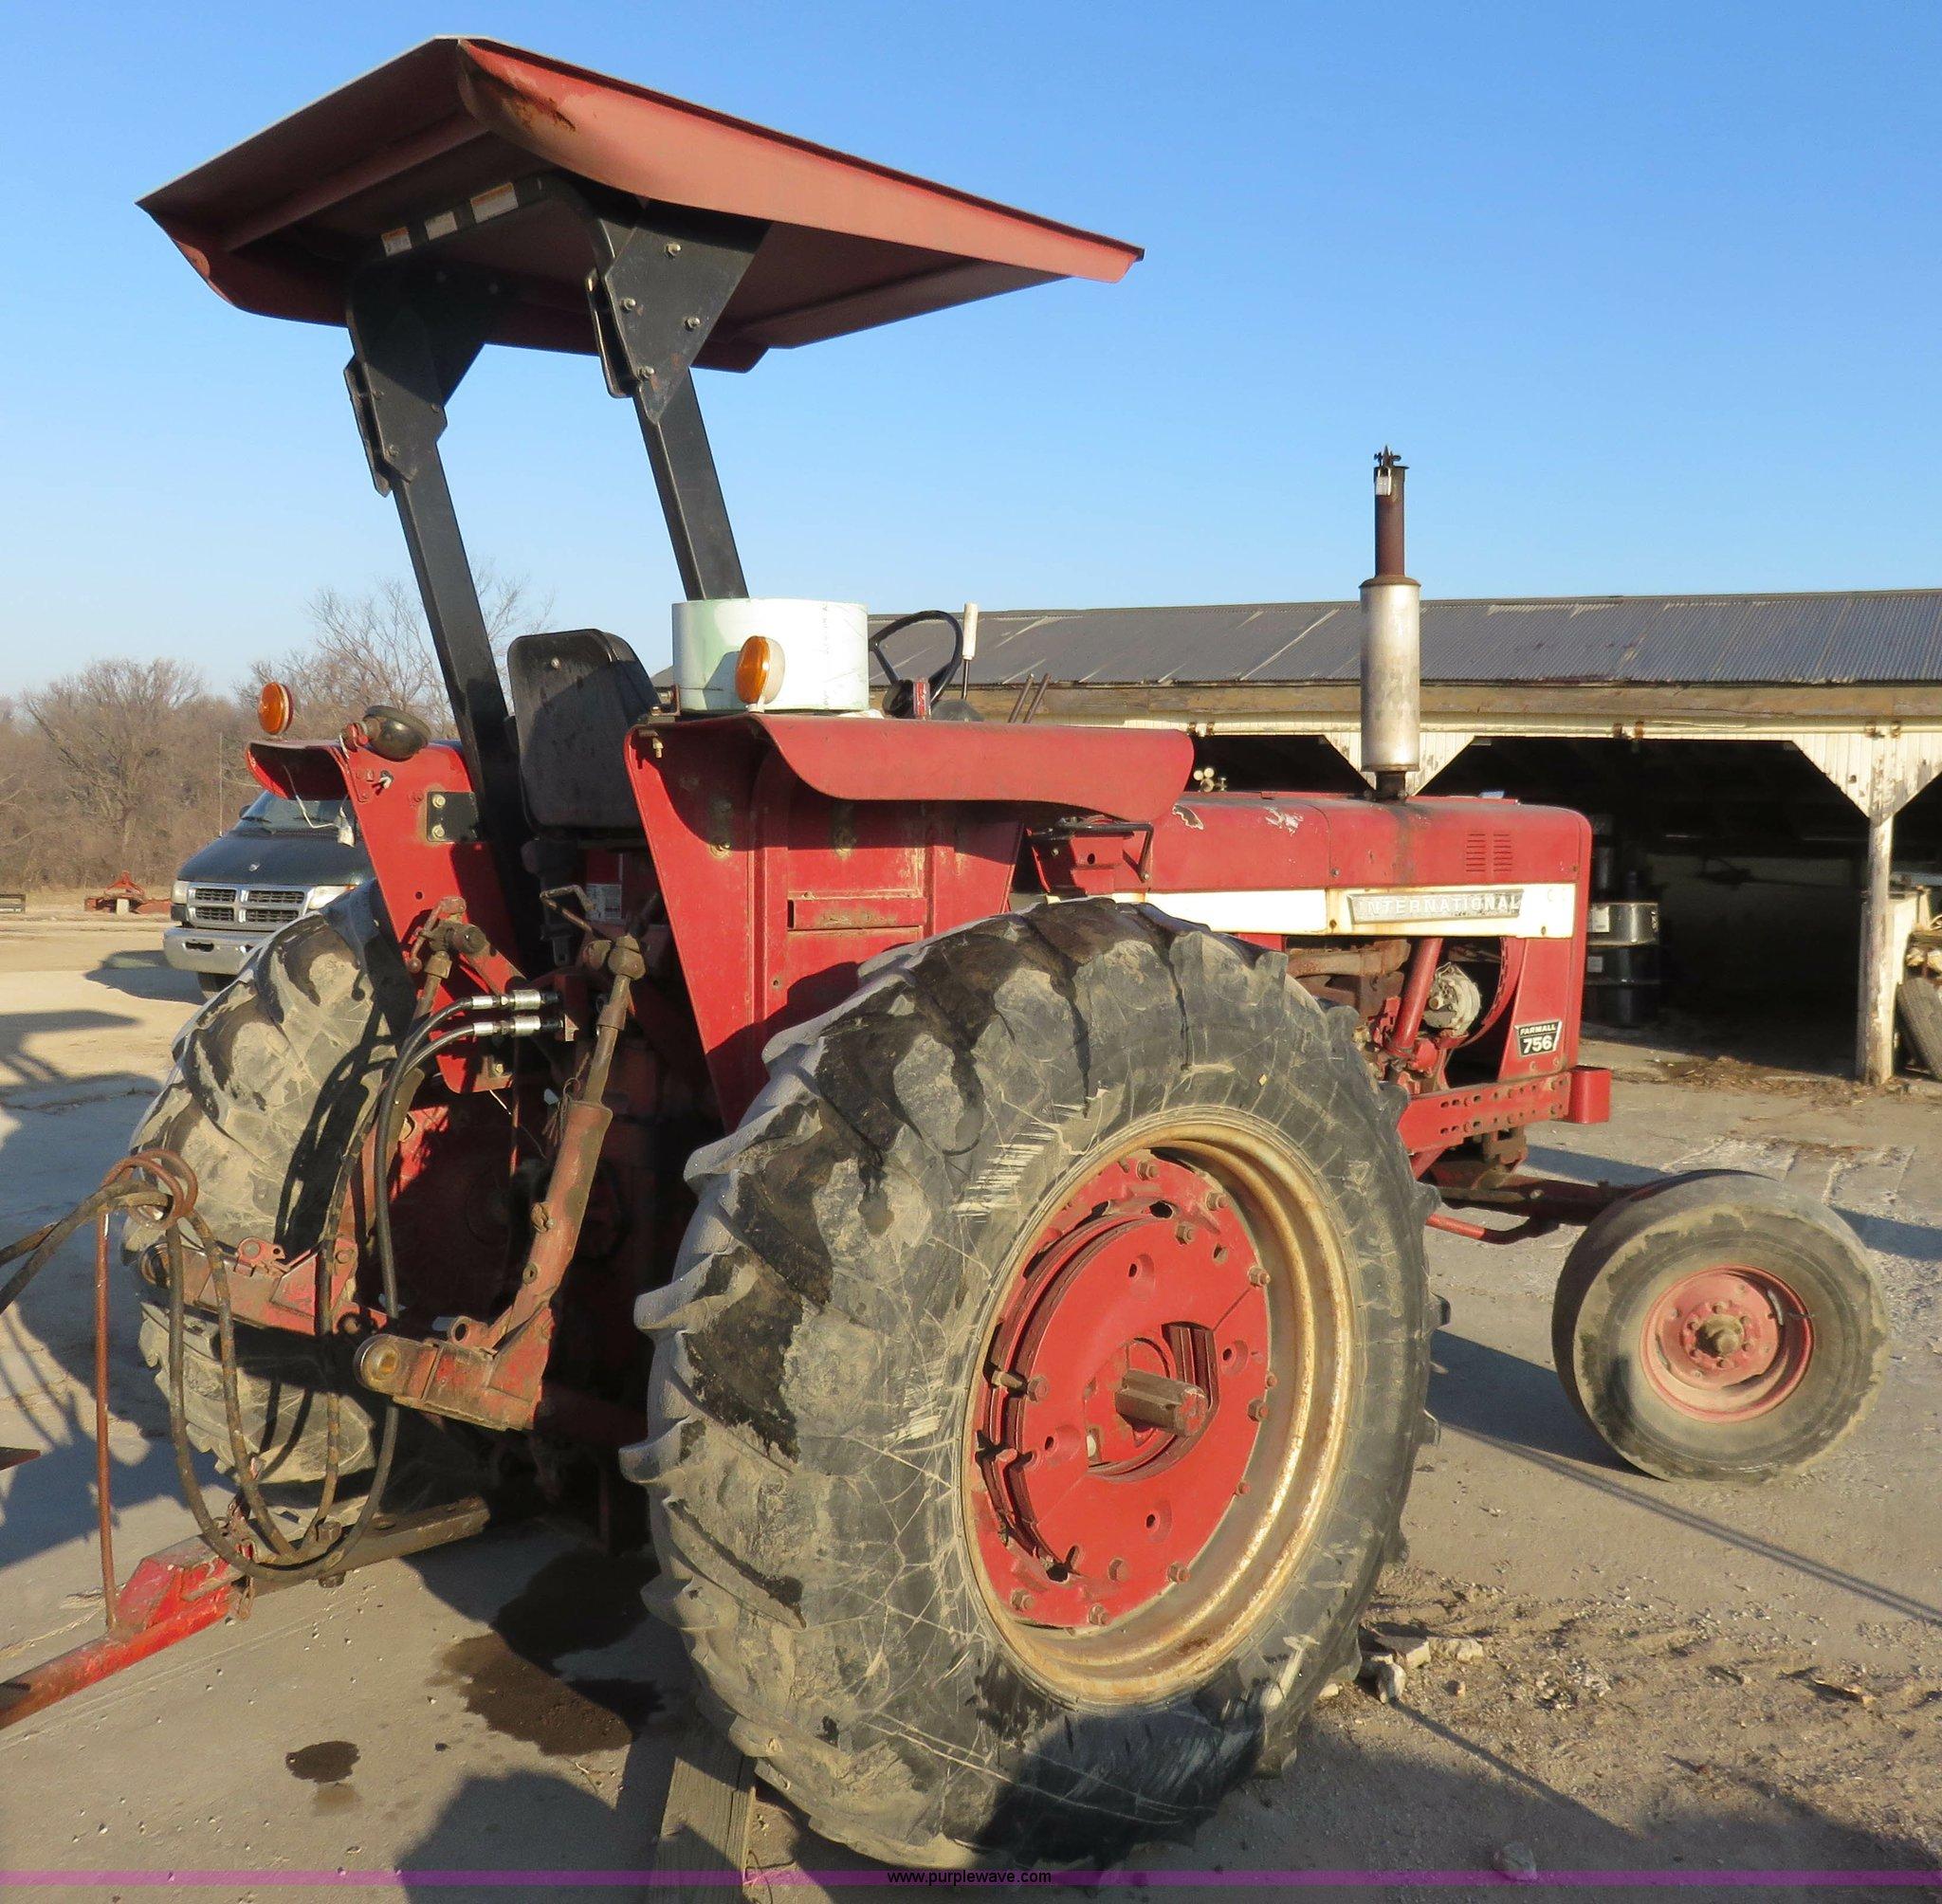 ... International Farmall 756 tractor Full size in new window ...